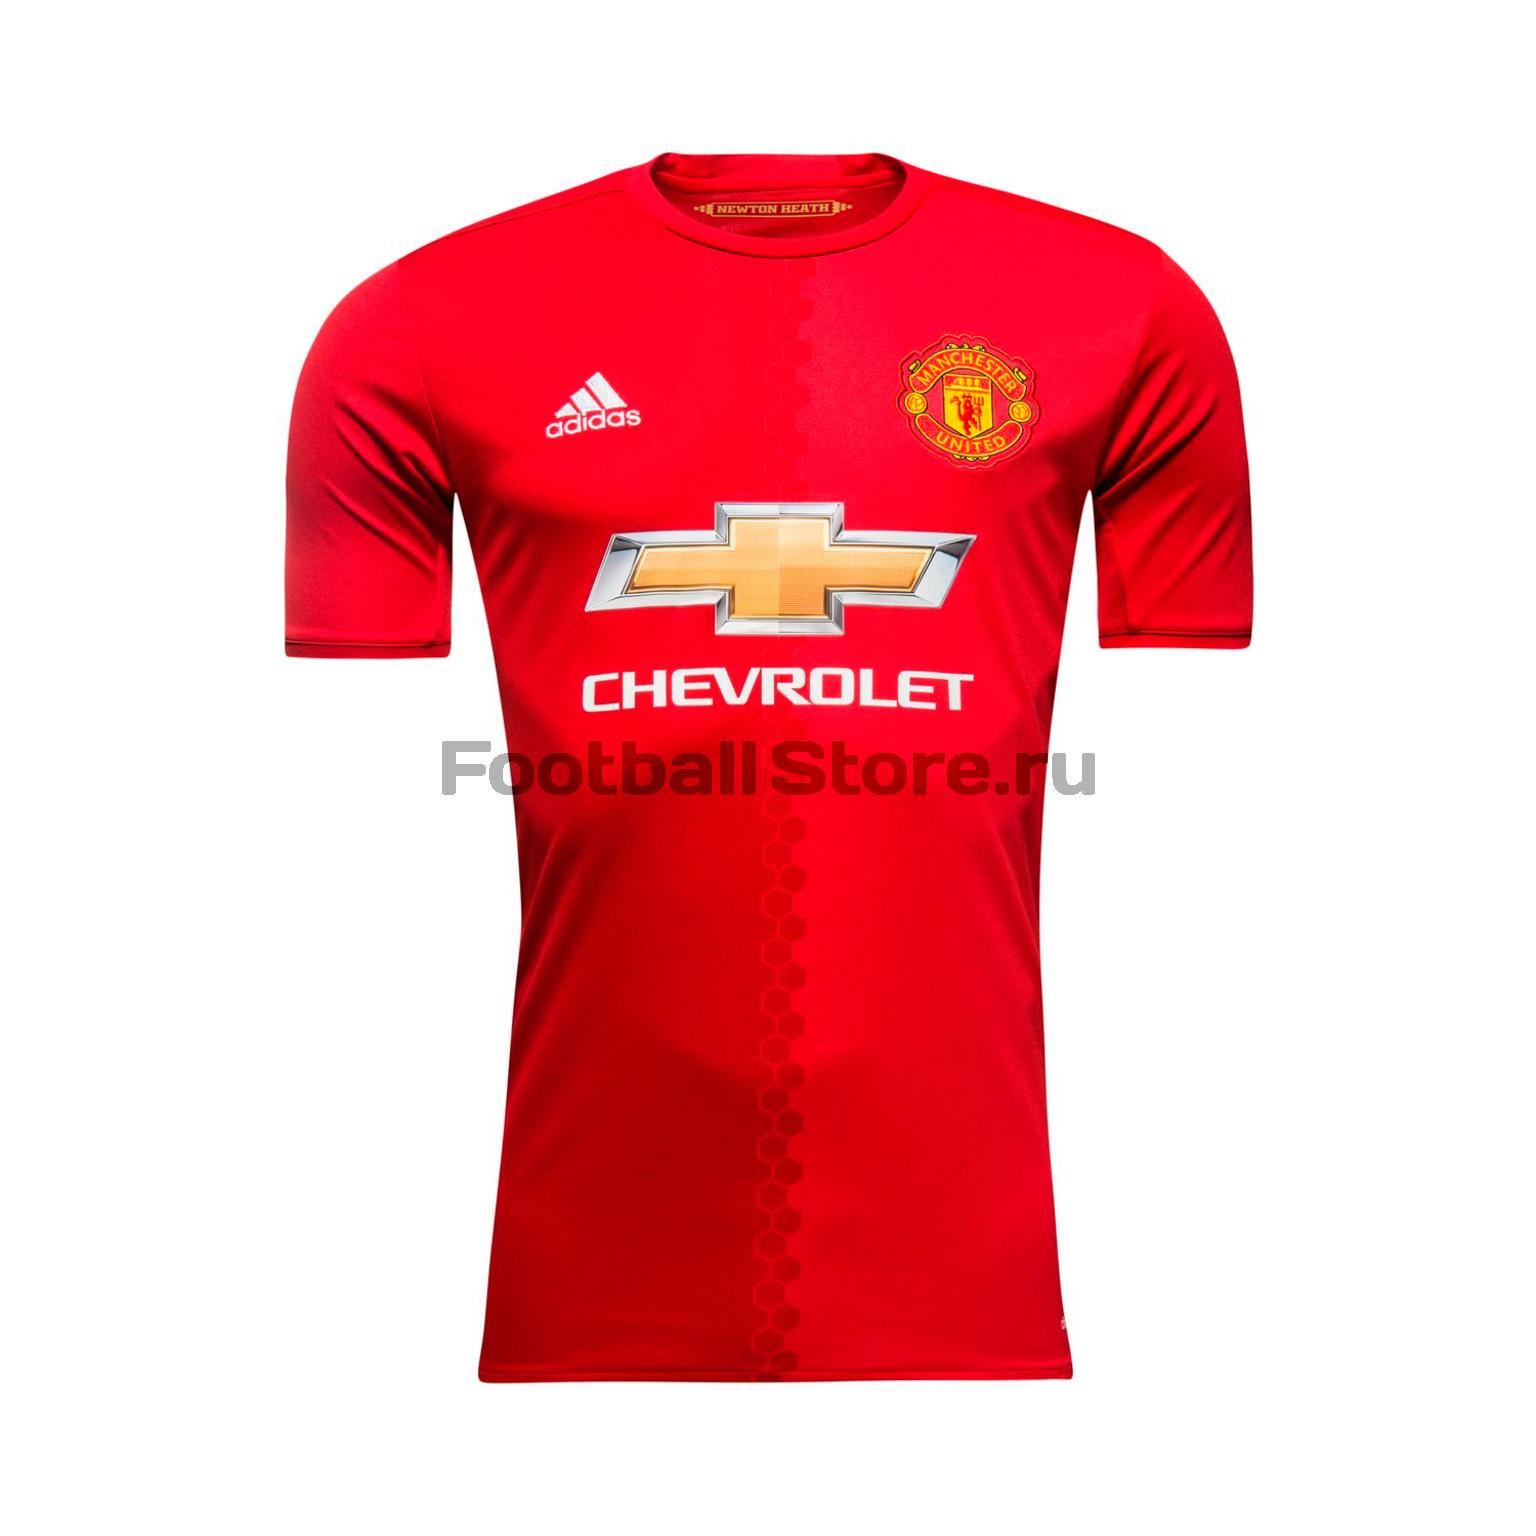 Manchester United Adidas Футболка игровая Adidas Manchester United Home AI6720